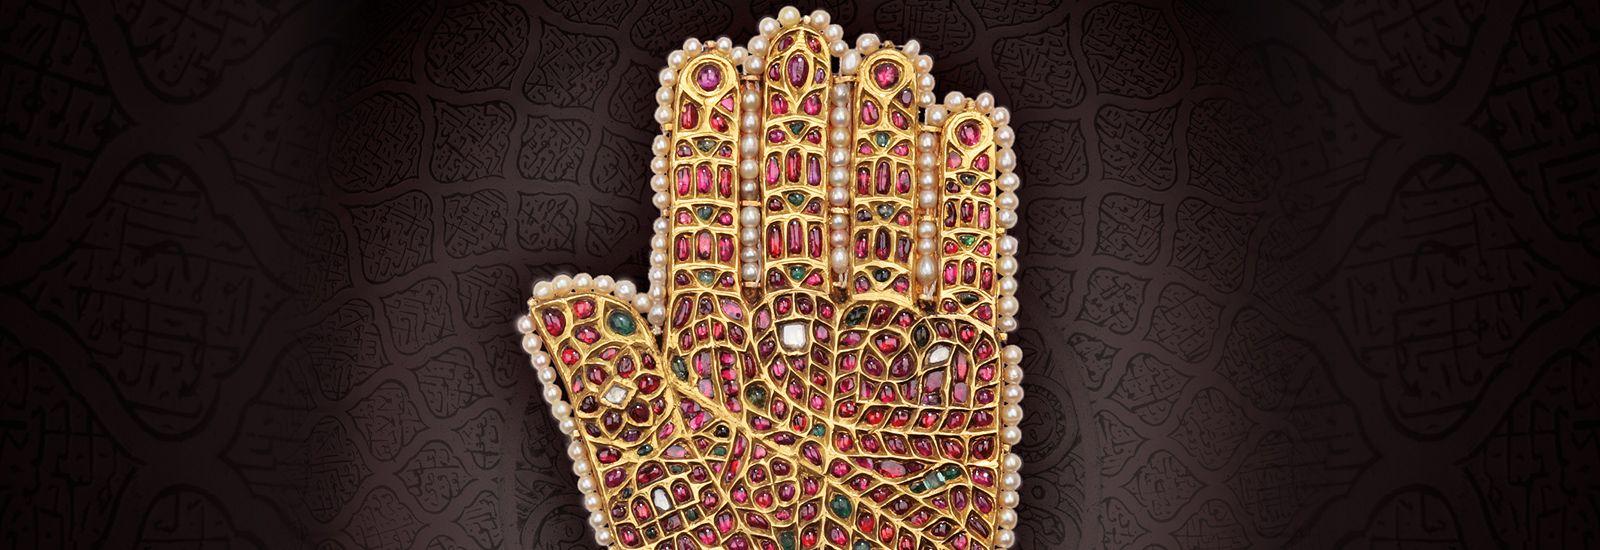 Jewelled hand art piece